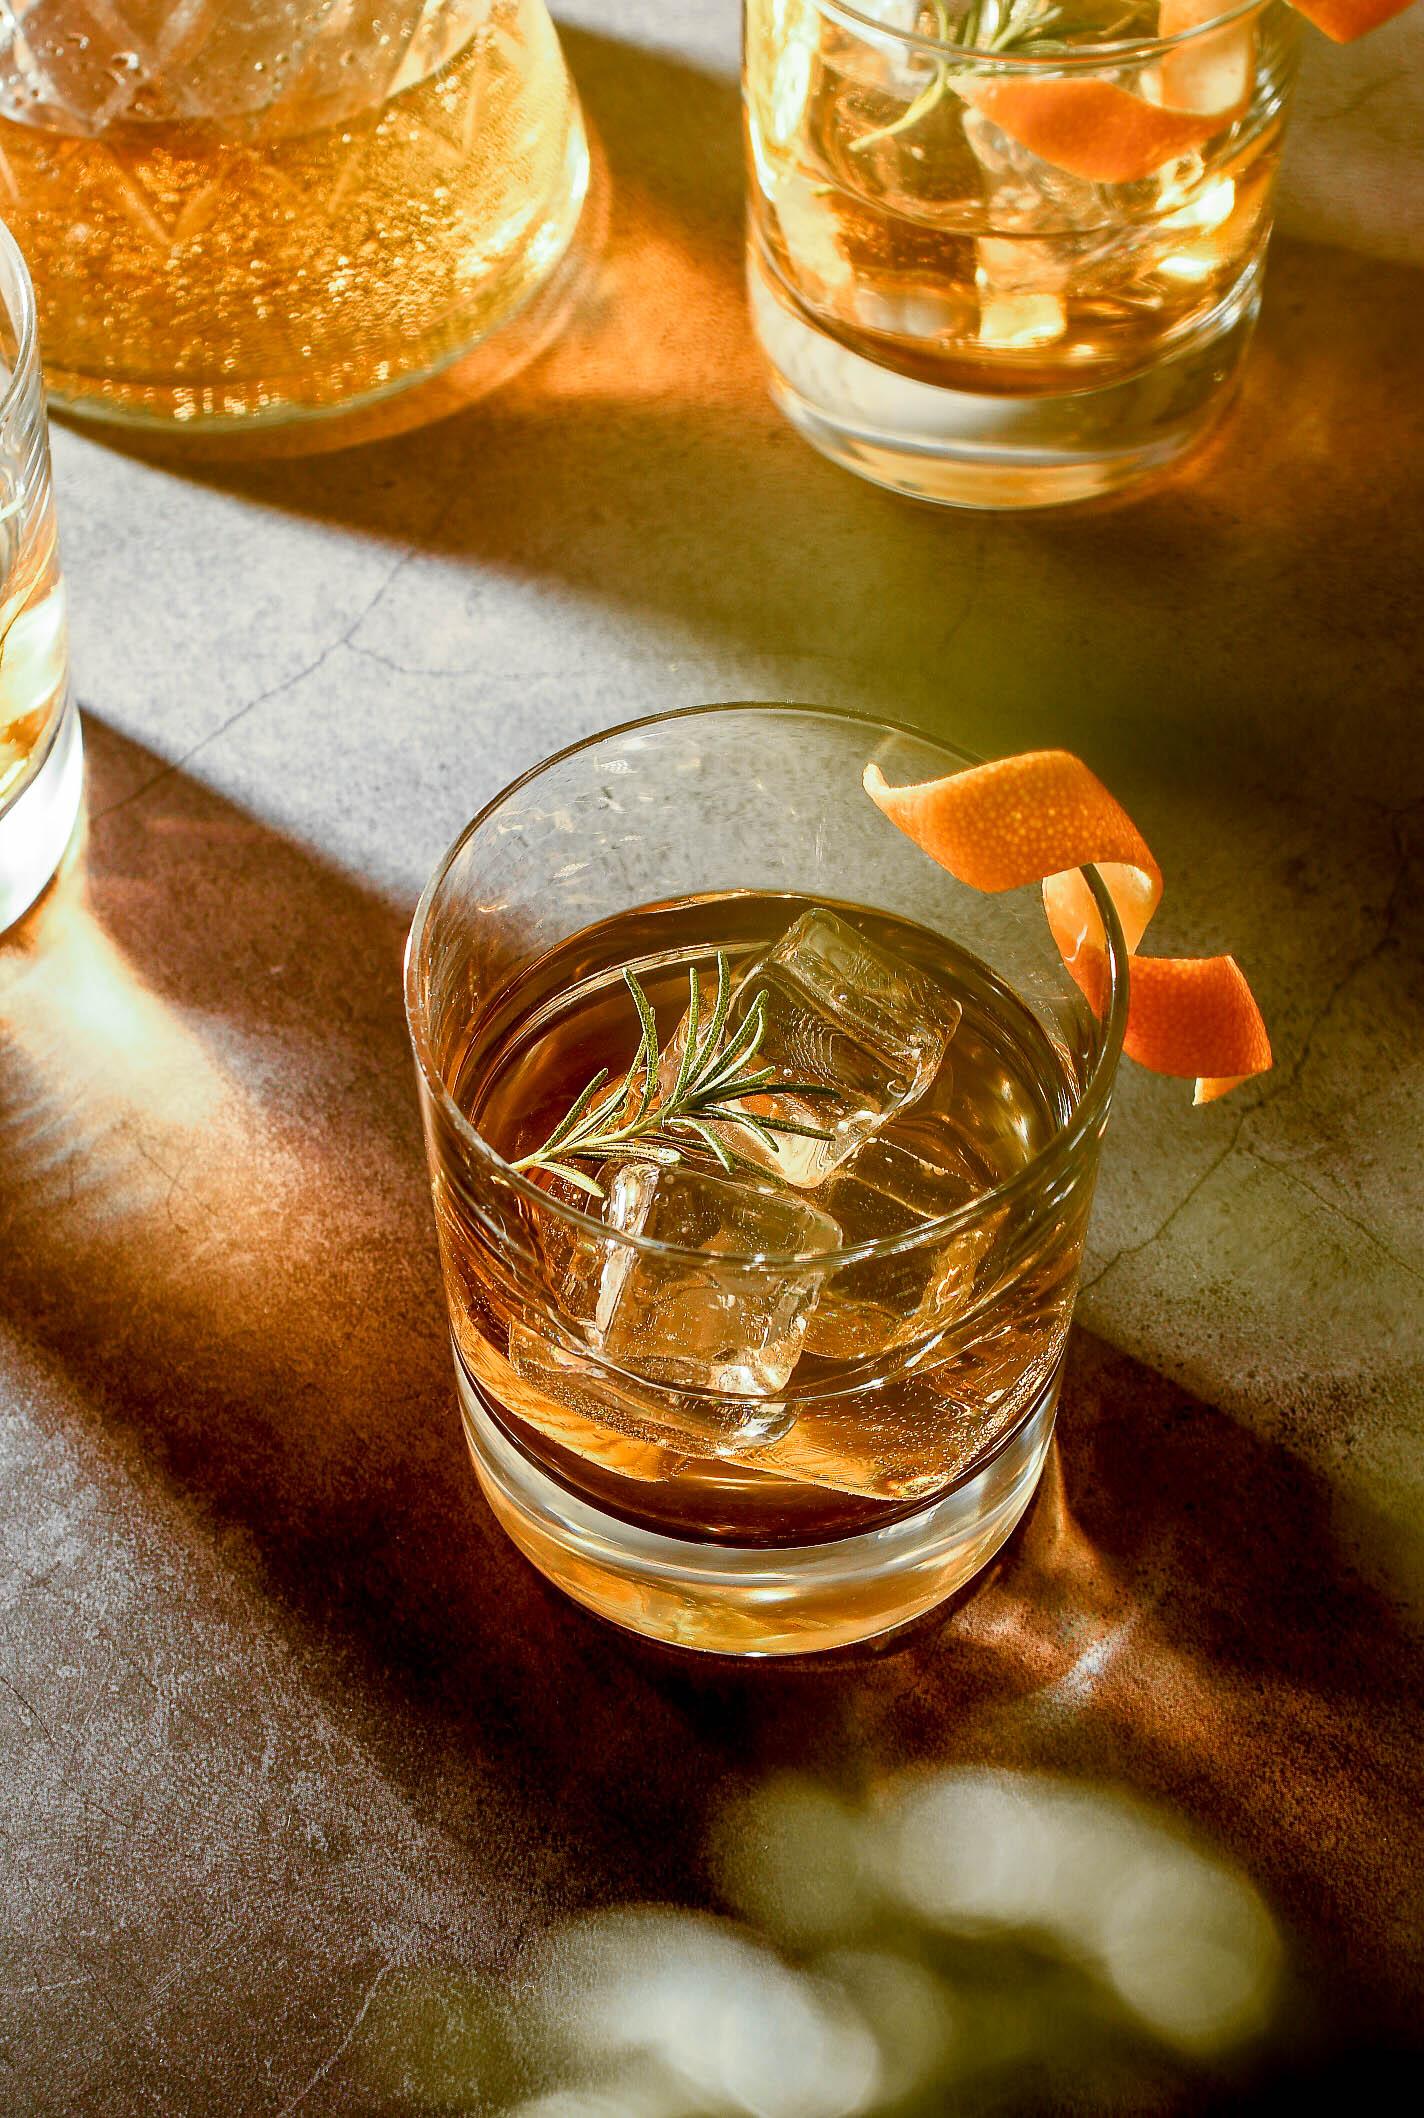 Home economist, food & drink stylist Madrid cóctel cocktail